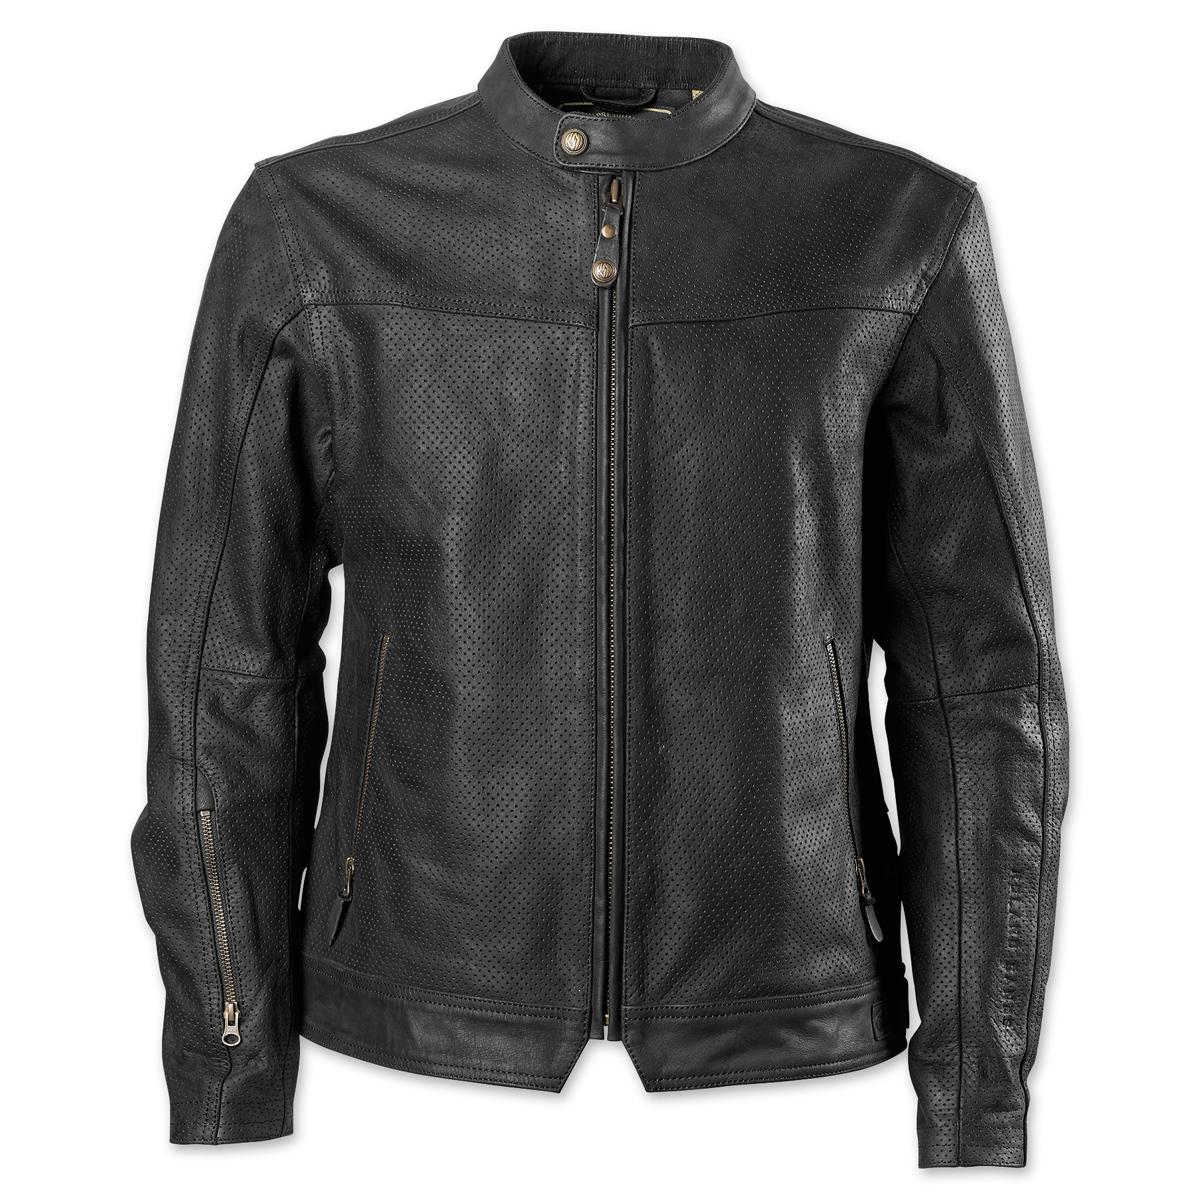 RSD Apparel Men's Walker Black Perforated Leather Jacket